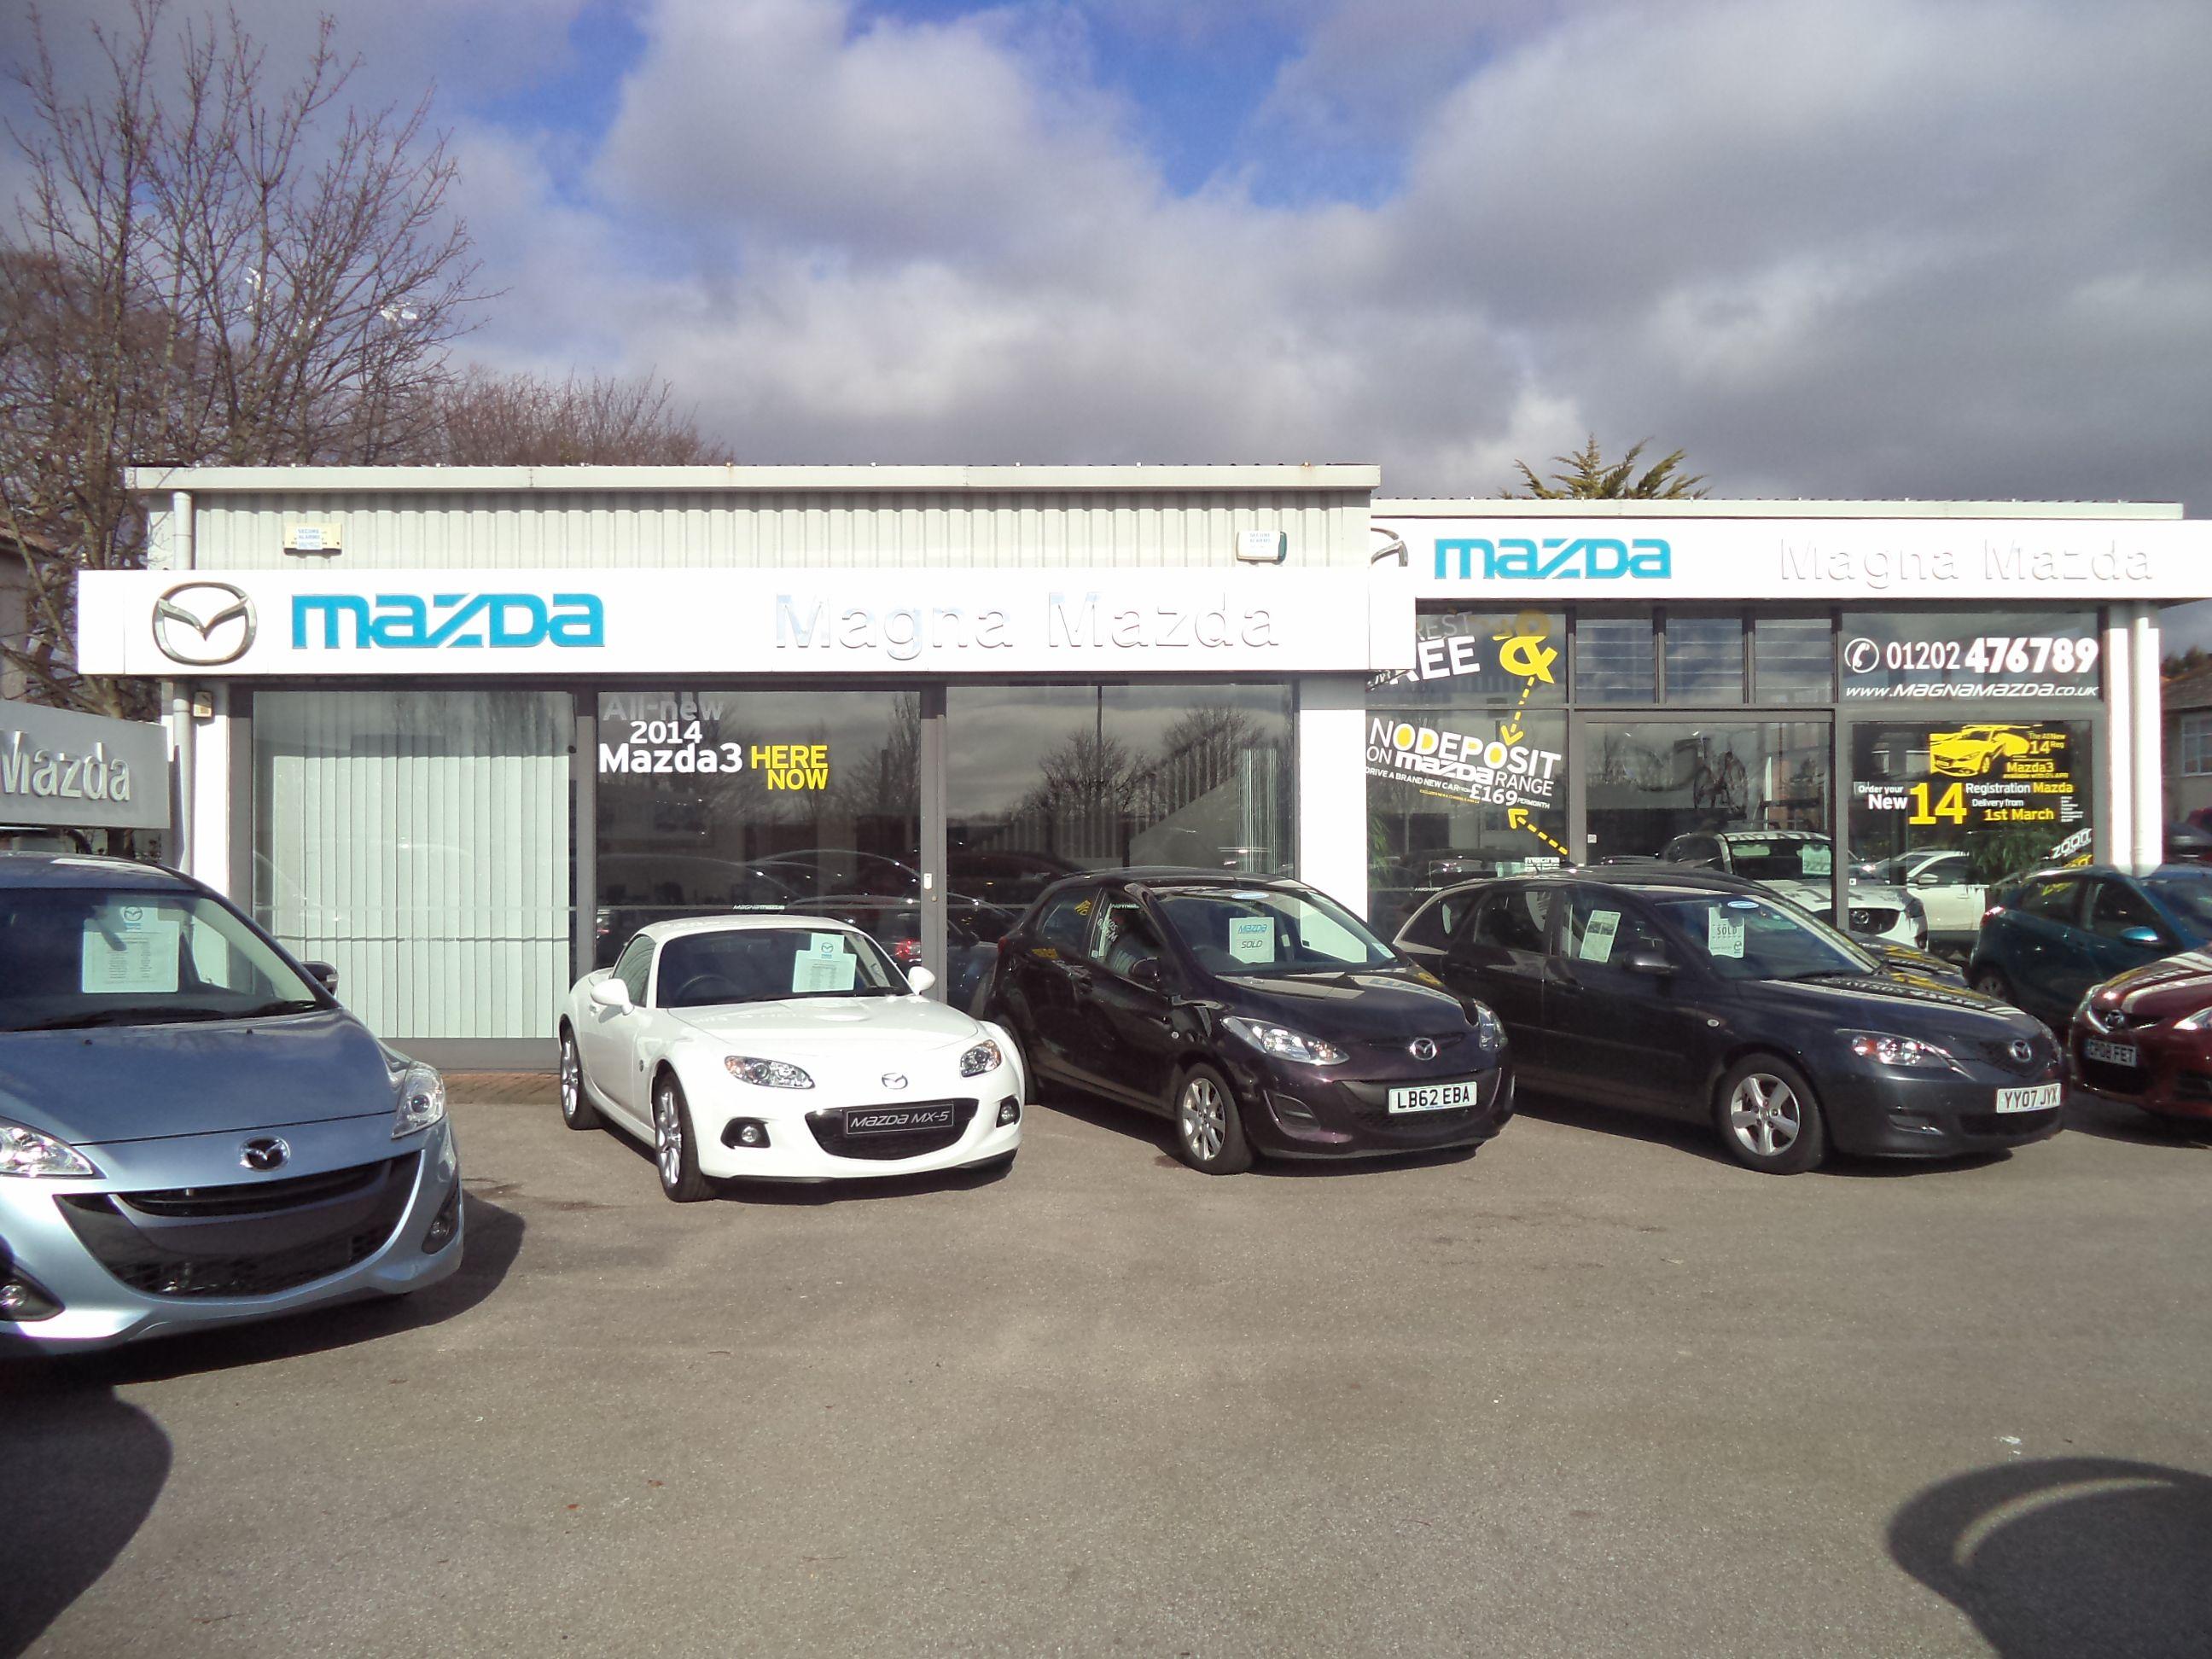 Christchurch Showroom Magna Mazda Christchurch Pinterest Mazda - Magna mazda